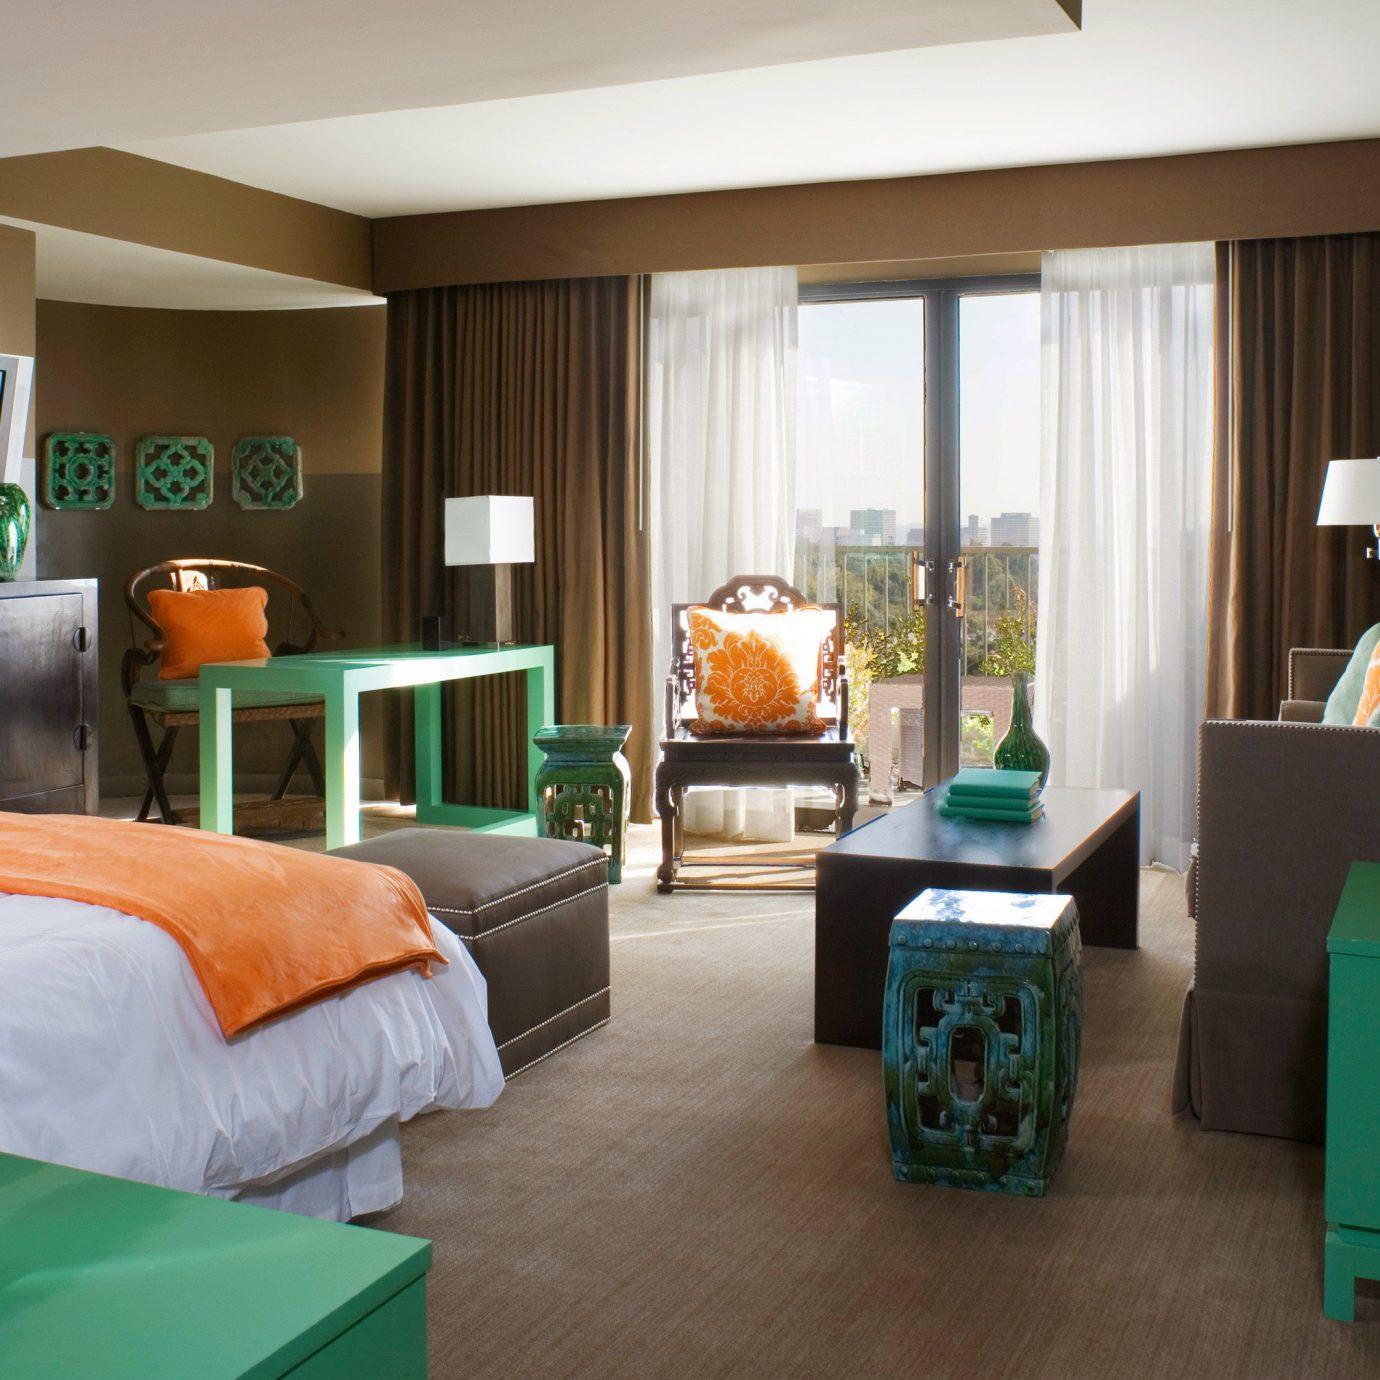 Bedroom property condominium living room Suite home cottage Villa lamp flat